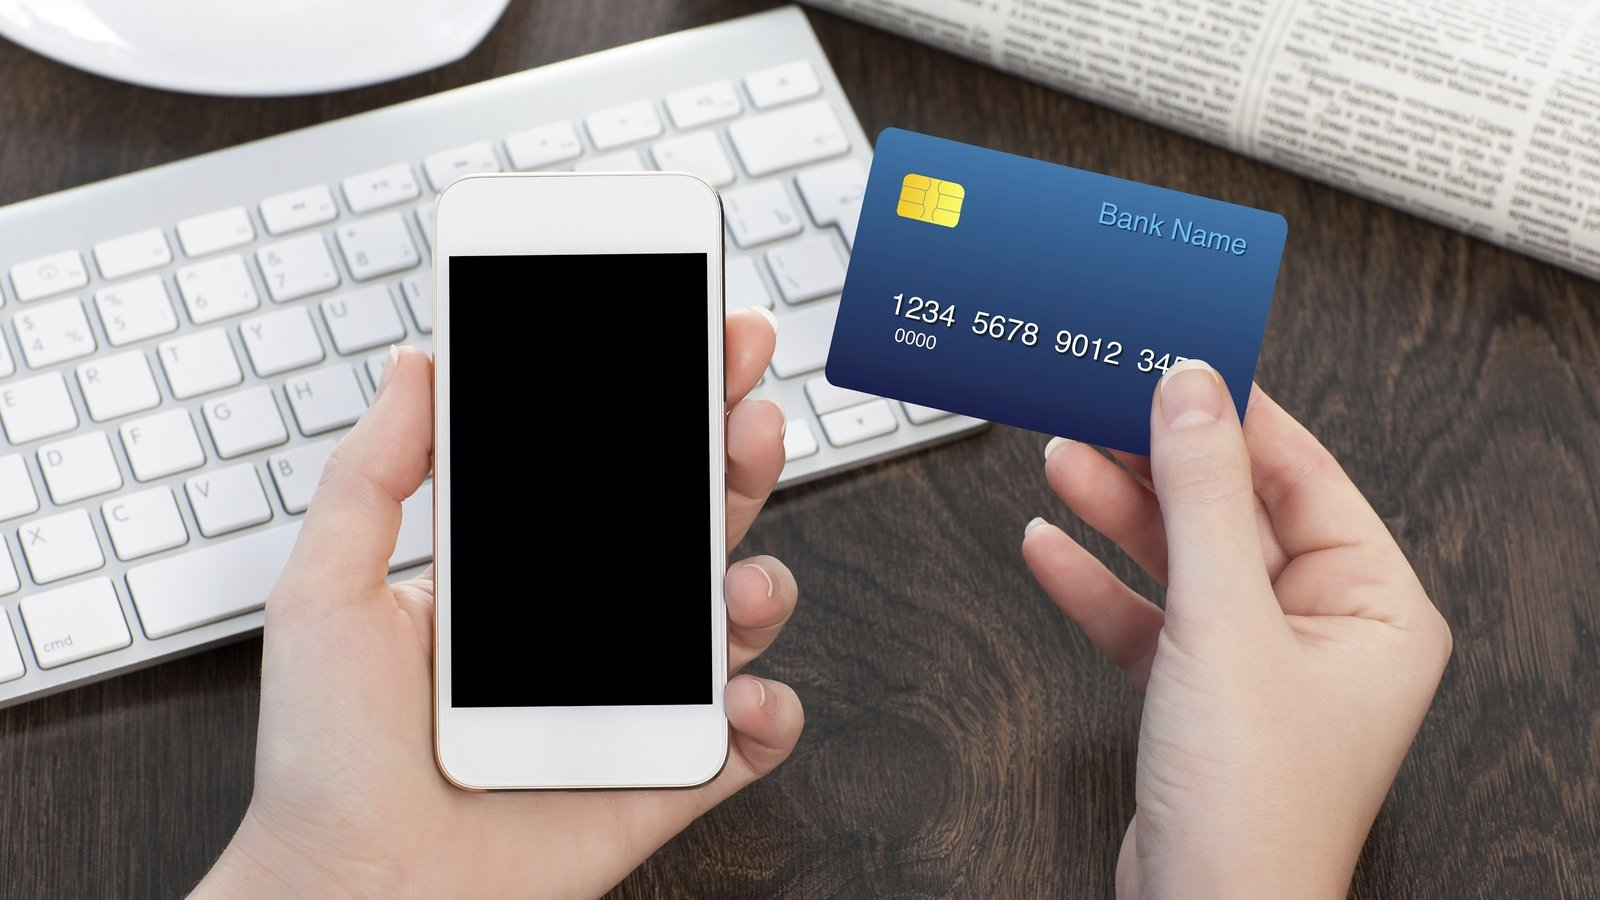 Prepaid Financial Services sold to Australia's EML